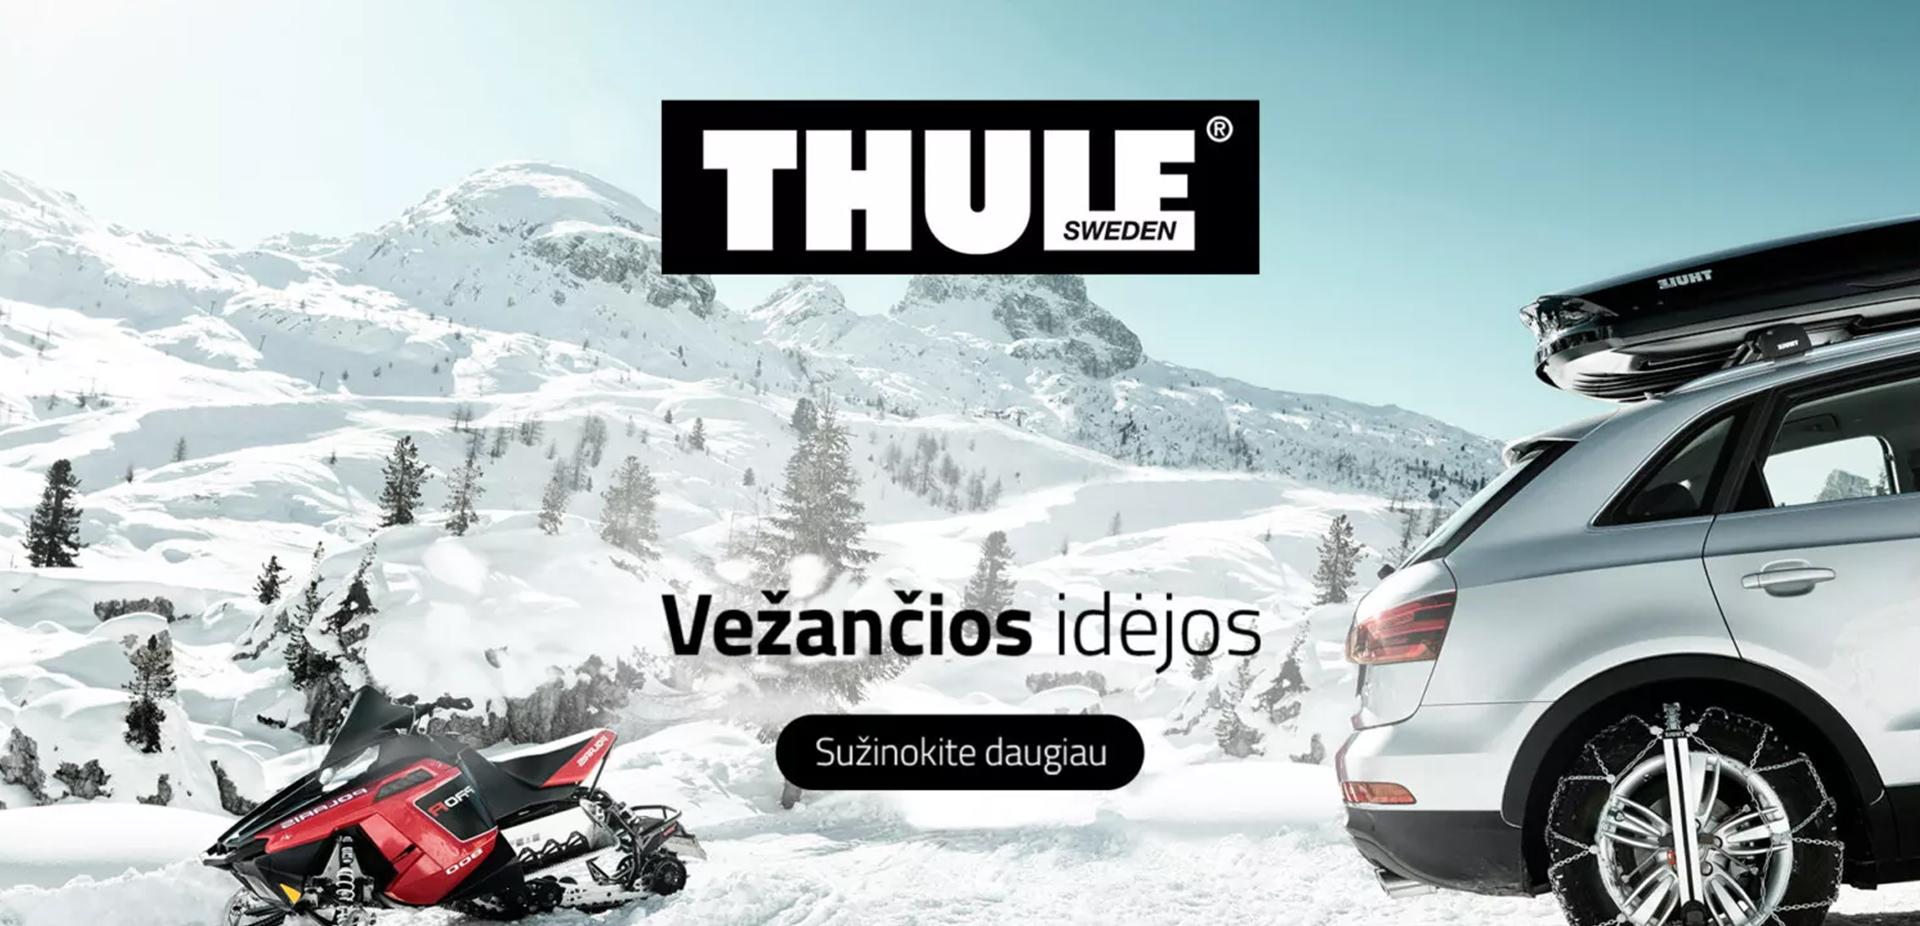 THULE1